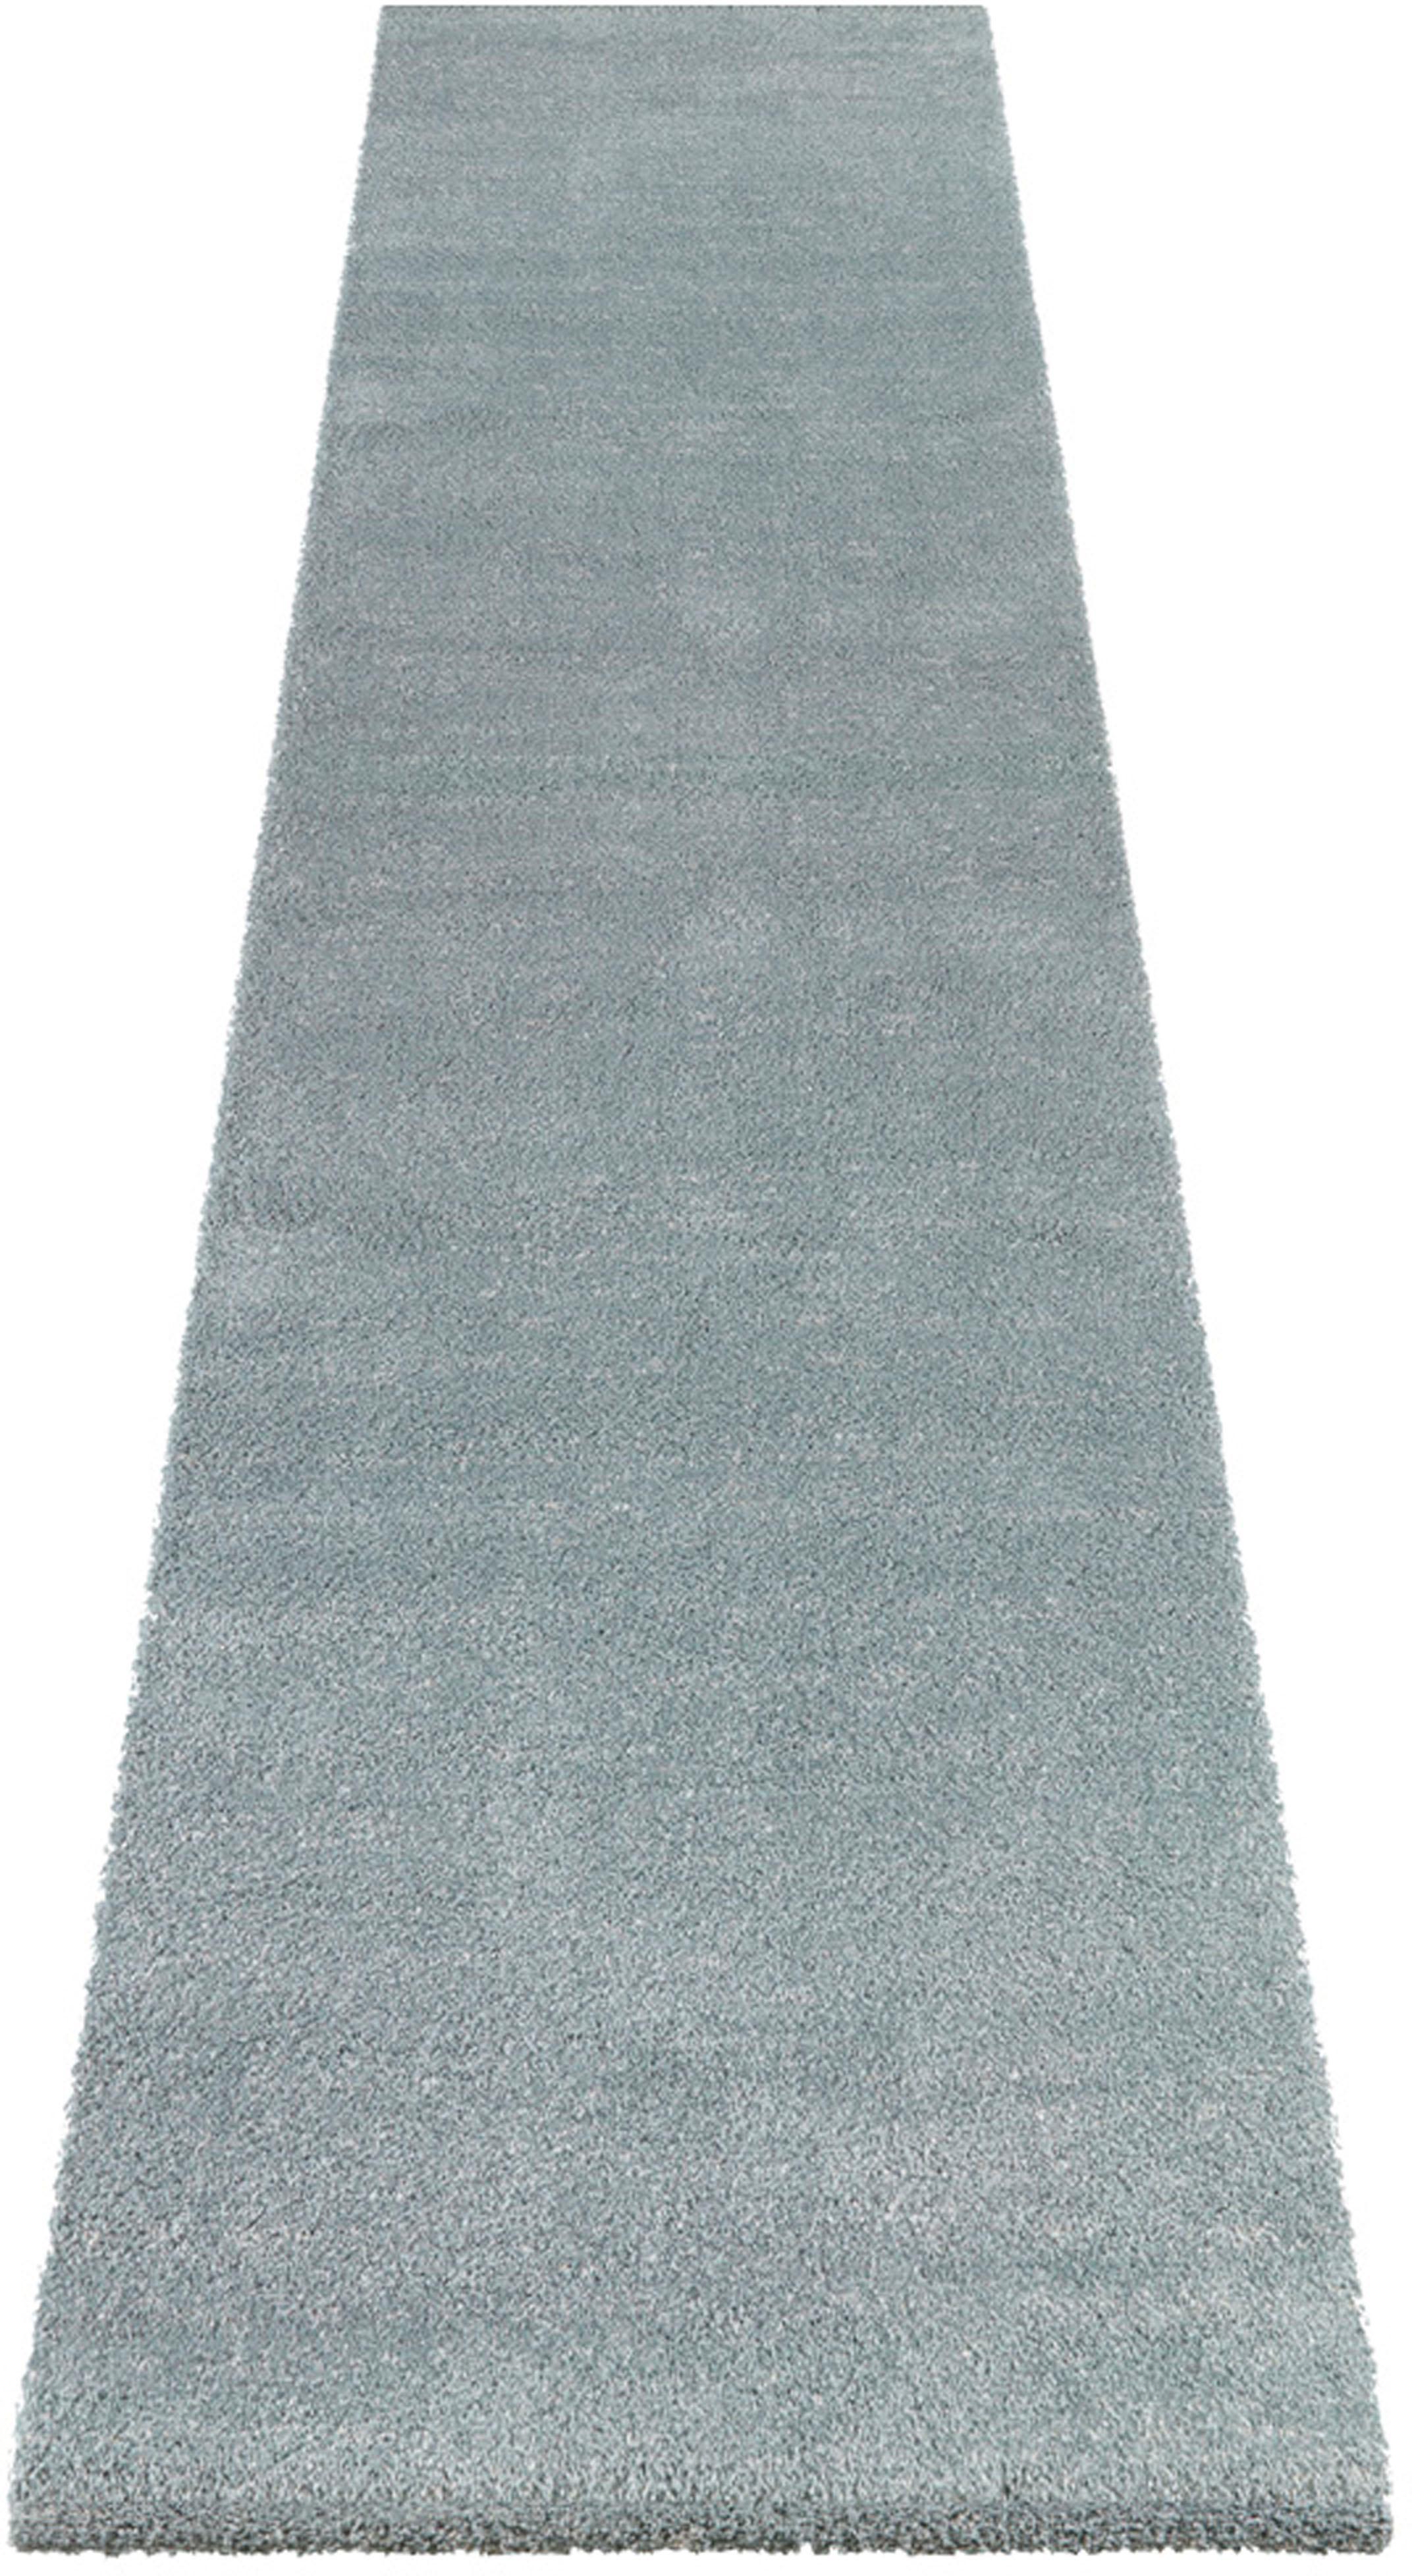 Hochflor-Läufer Orly ELLE Decor rechteckig Höhe 32 mm maschinell gewebt